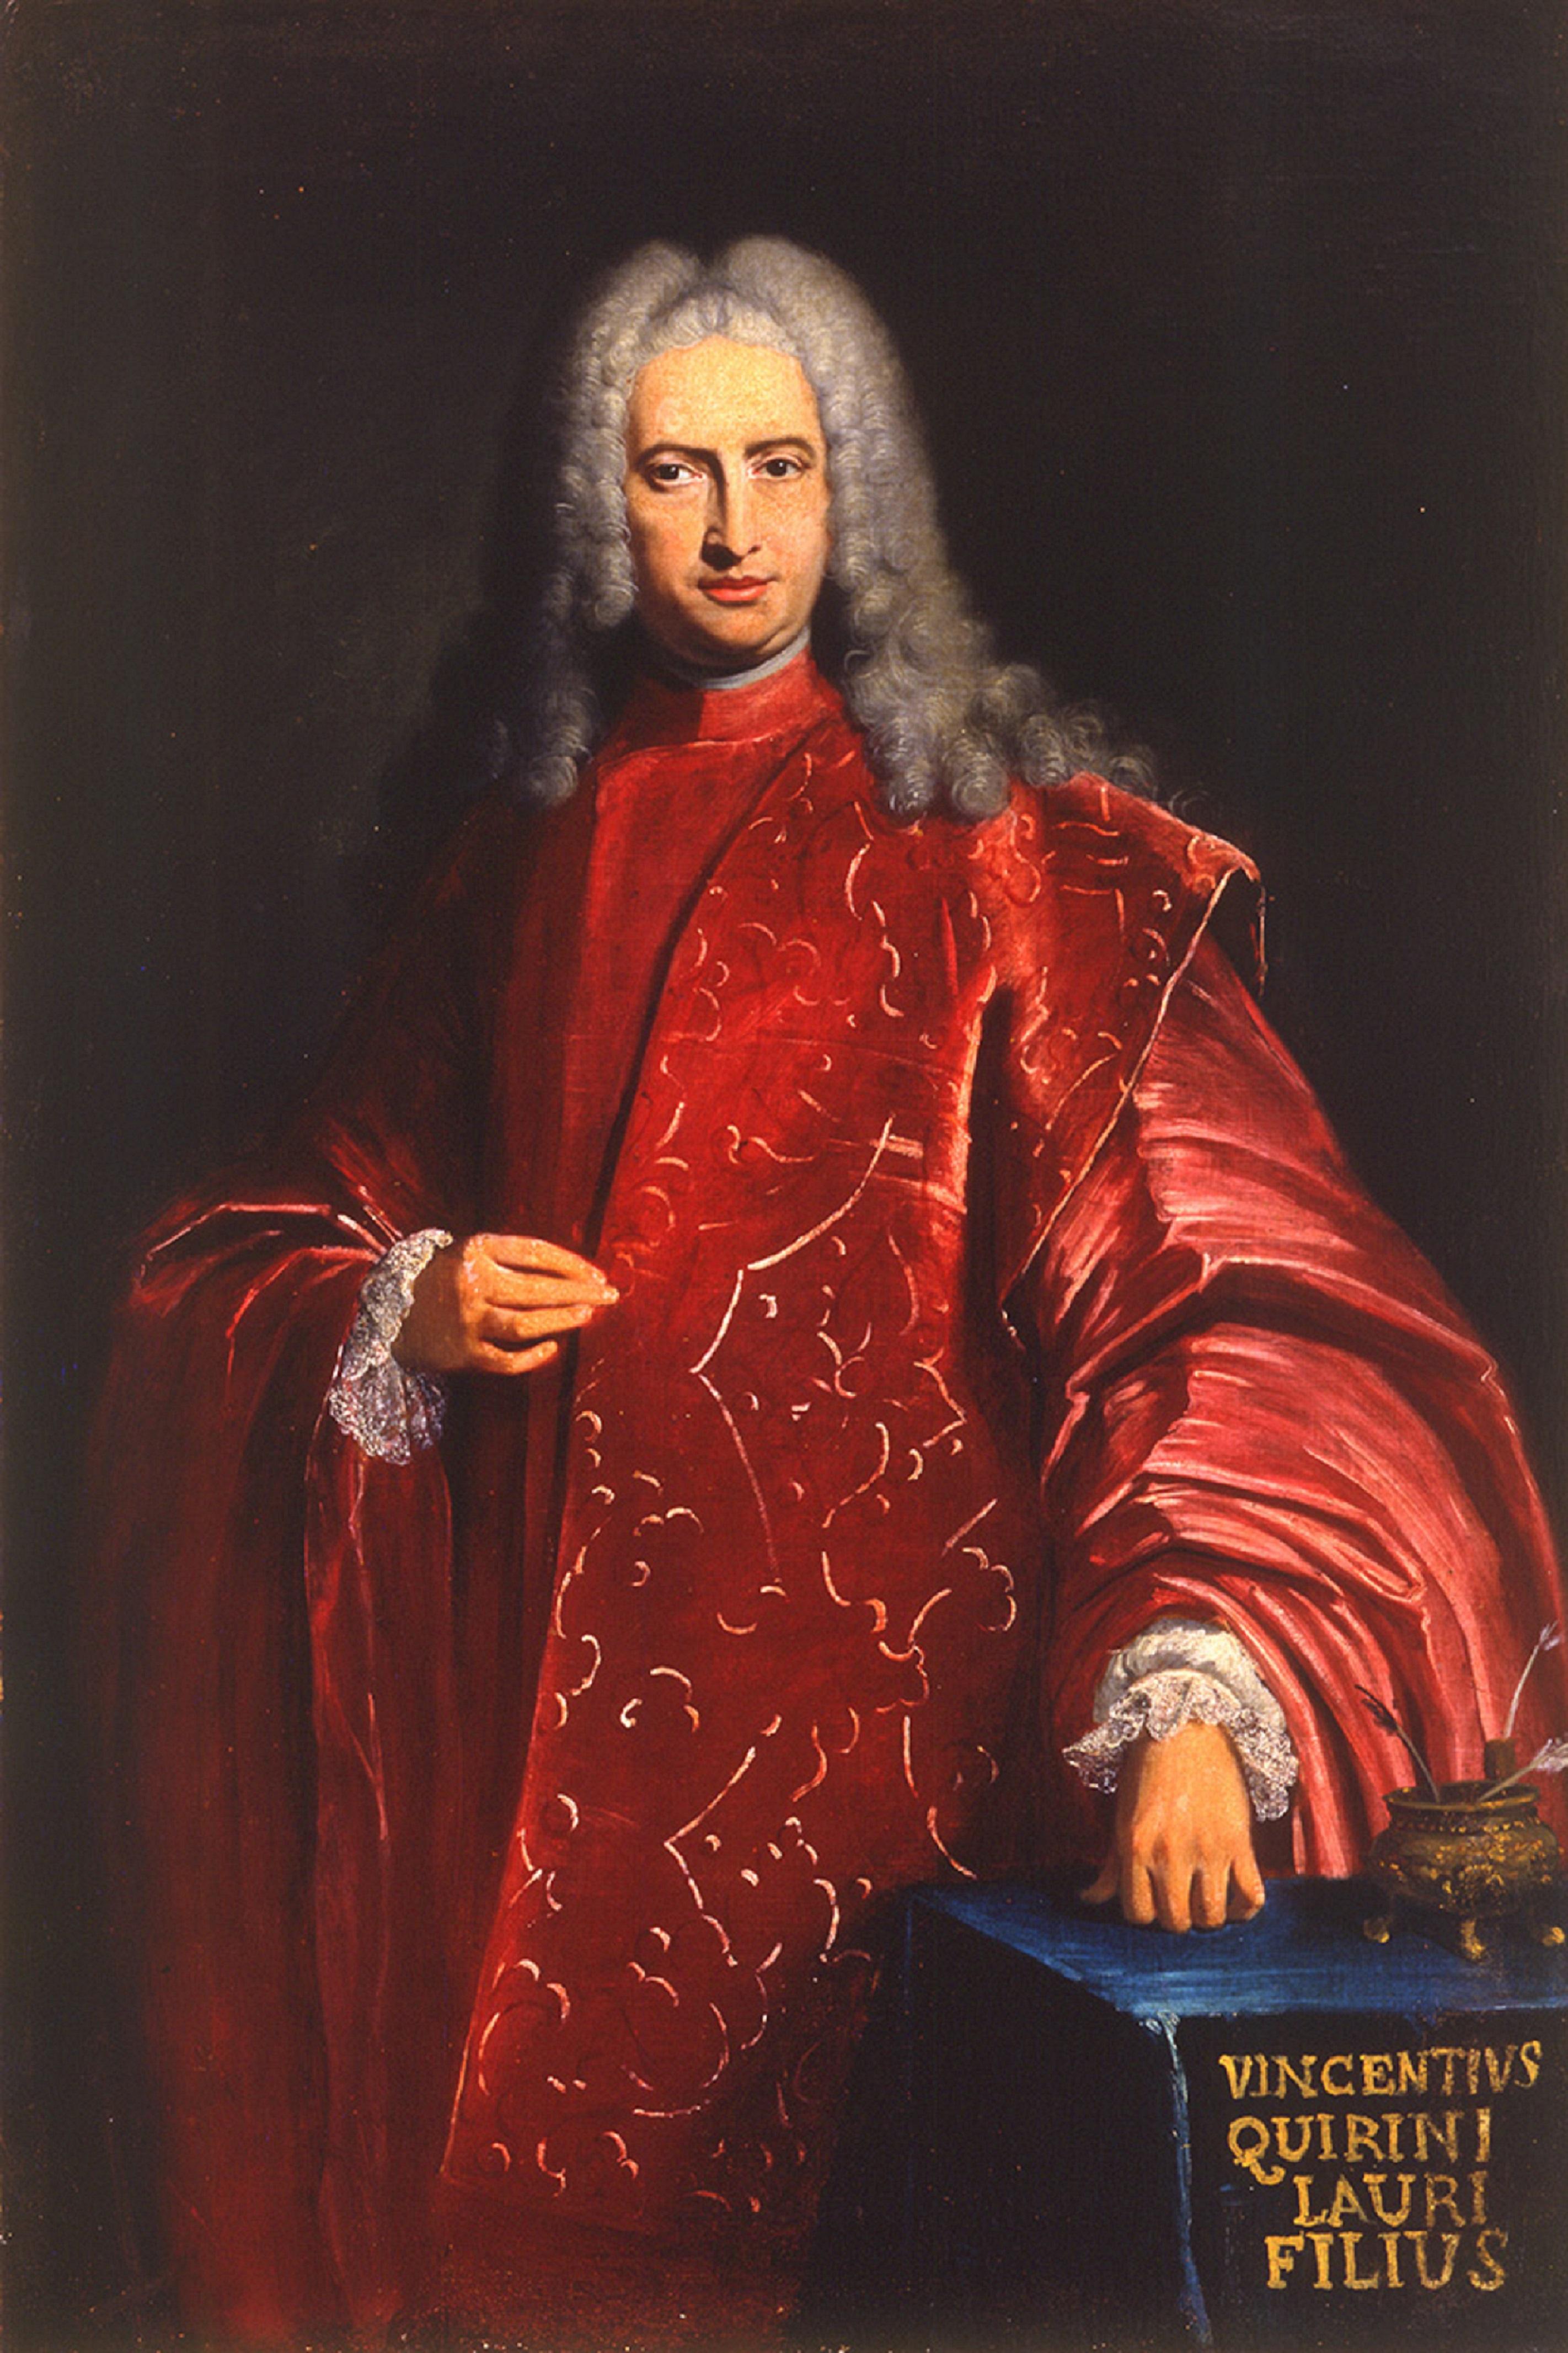 File:Bartolomeo Nazari - Portrait of Doge Vincenzo Querini - WGA16471 ...: commons.wikimedia.org/wiki/file:bartolomeo_nazari_-_portrait_of...